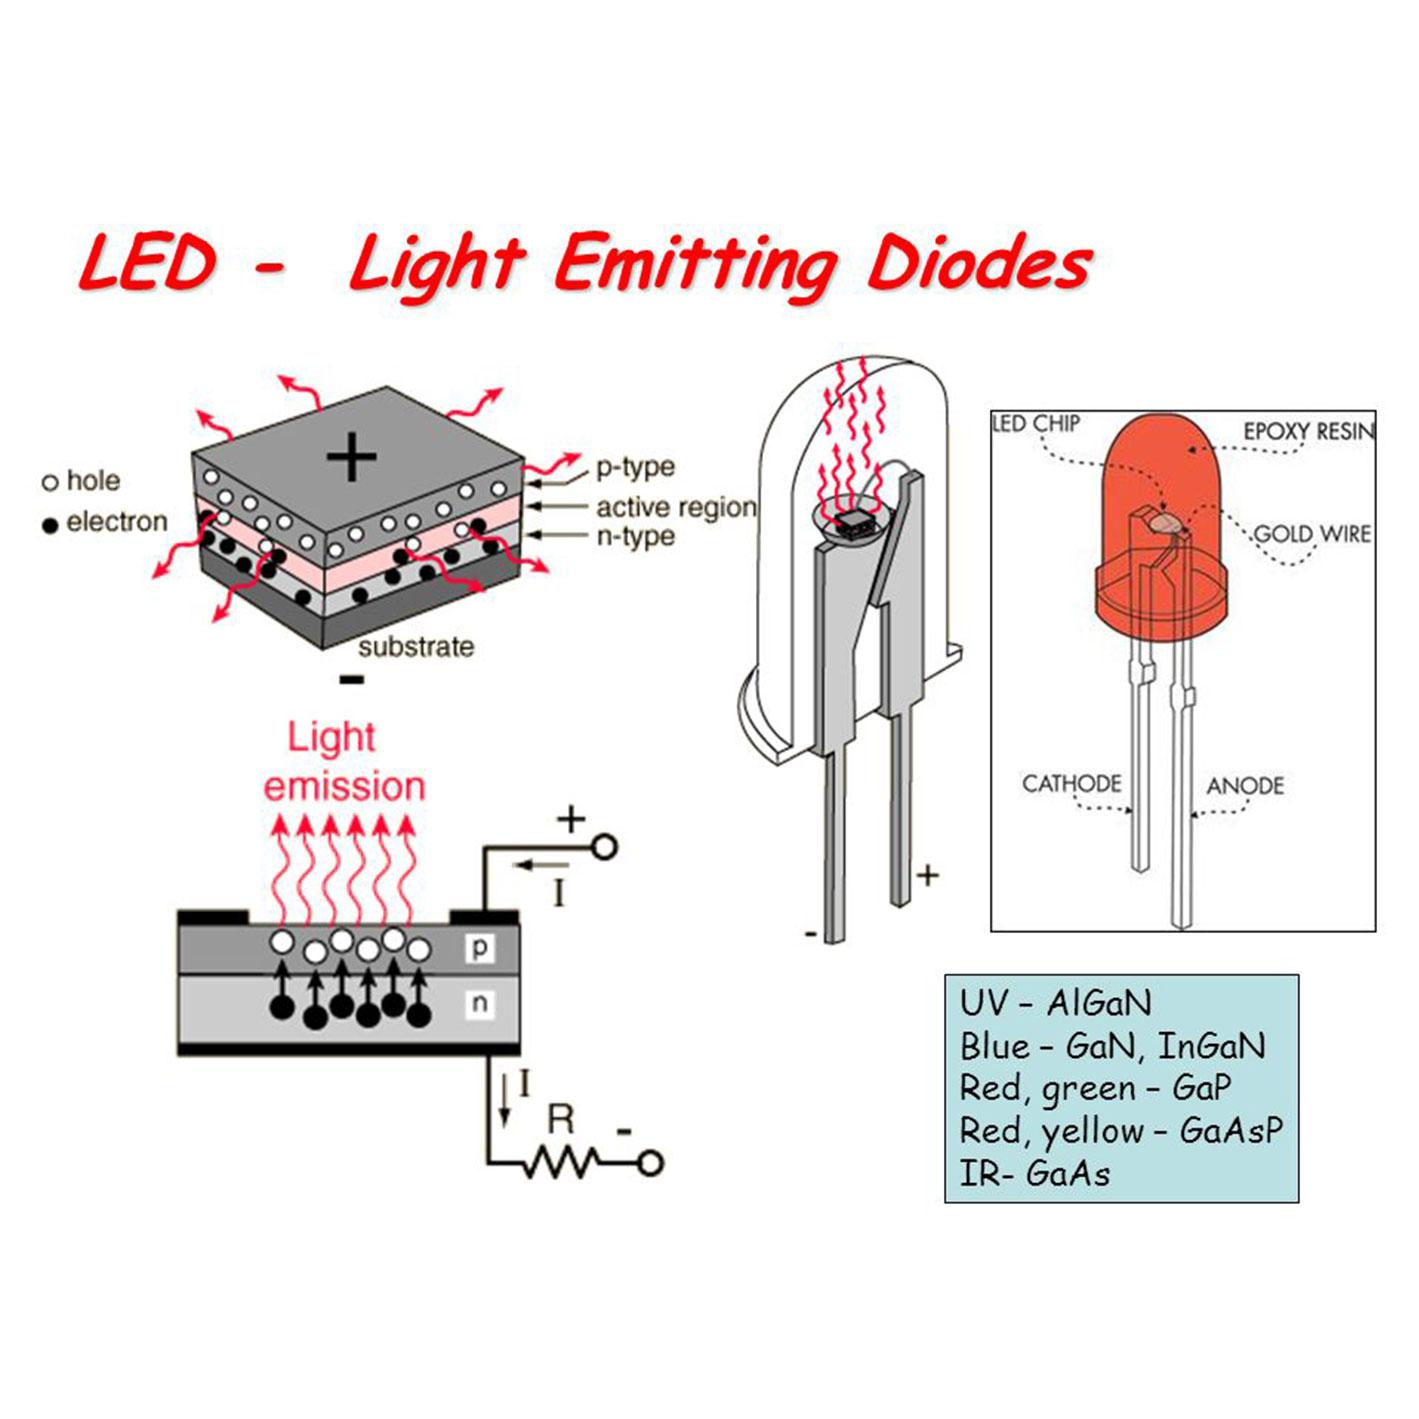 لامپ های SMD . LED